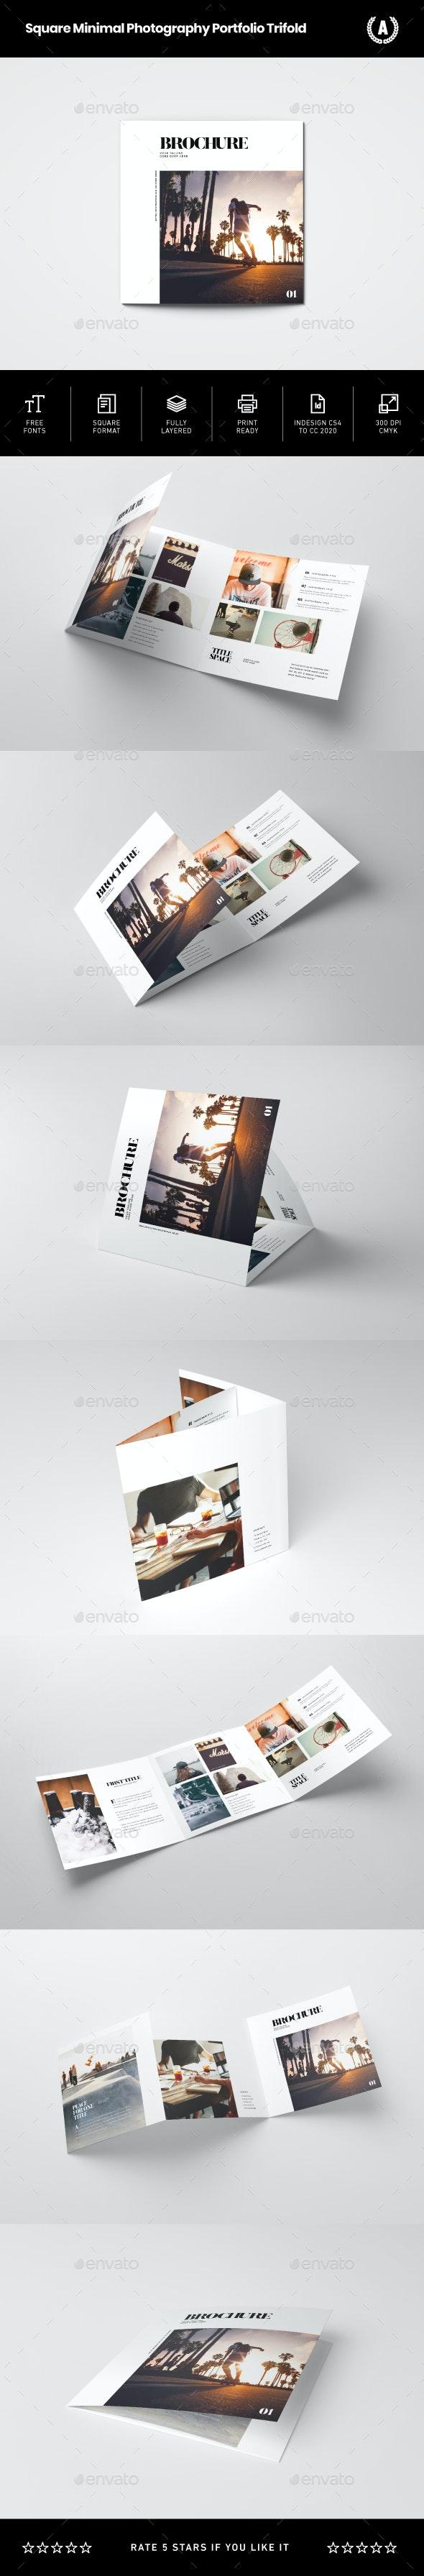 Square Minimal Photography Portfolio Trifold - Brochures Print Templates